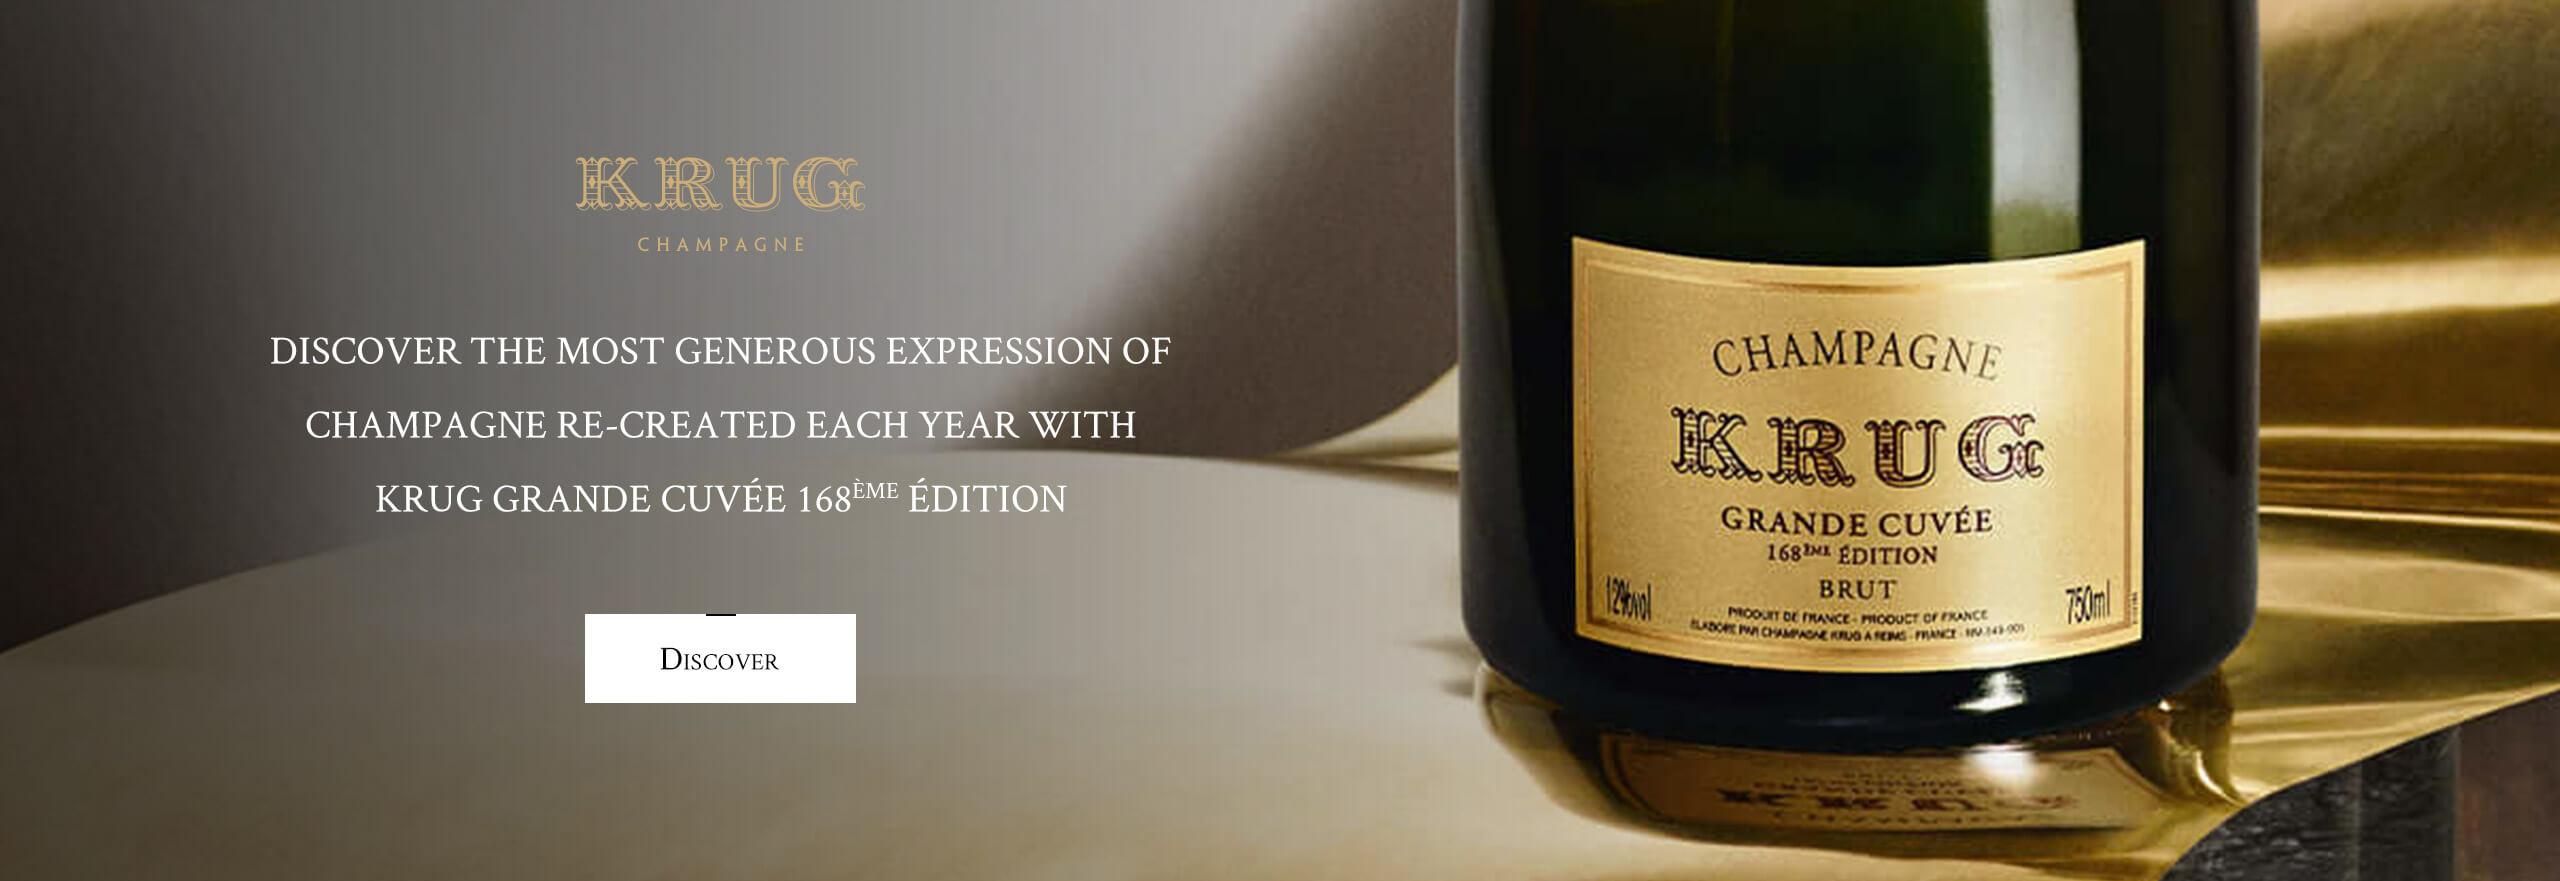 Champagne Krug Grande cuvée 168ème édition